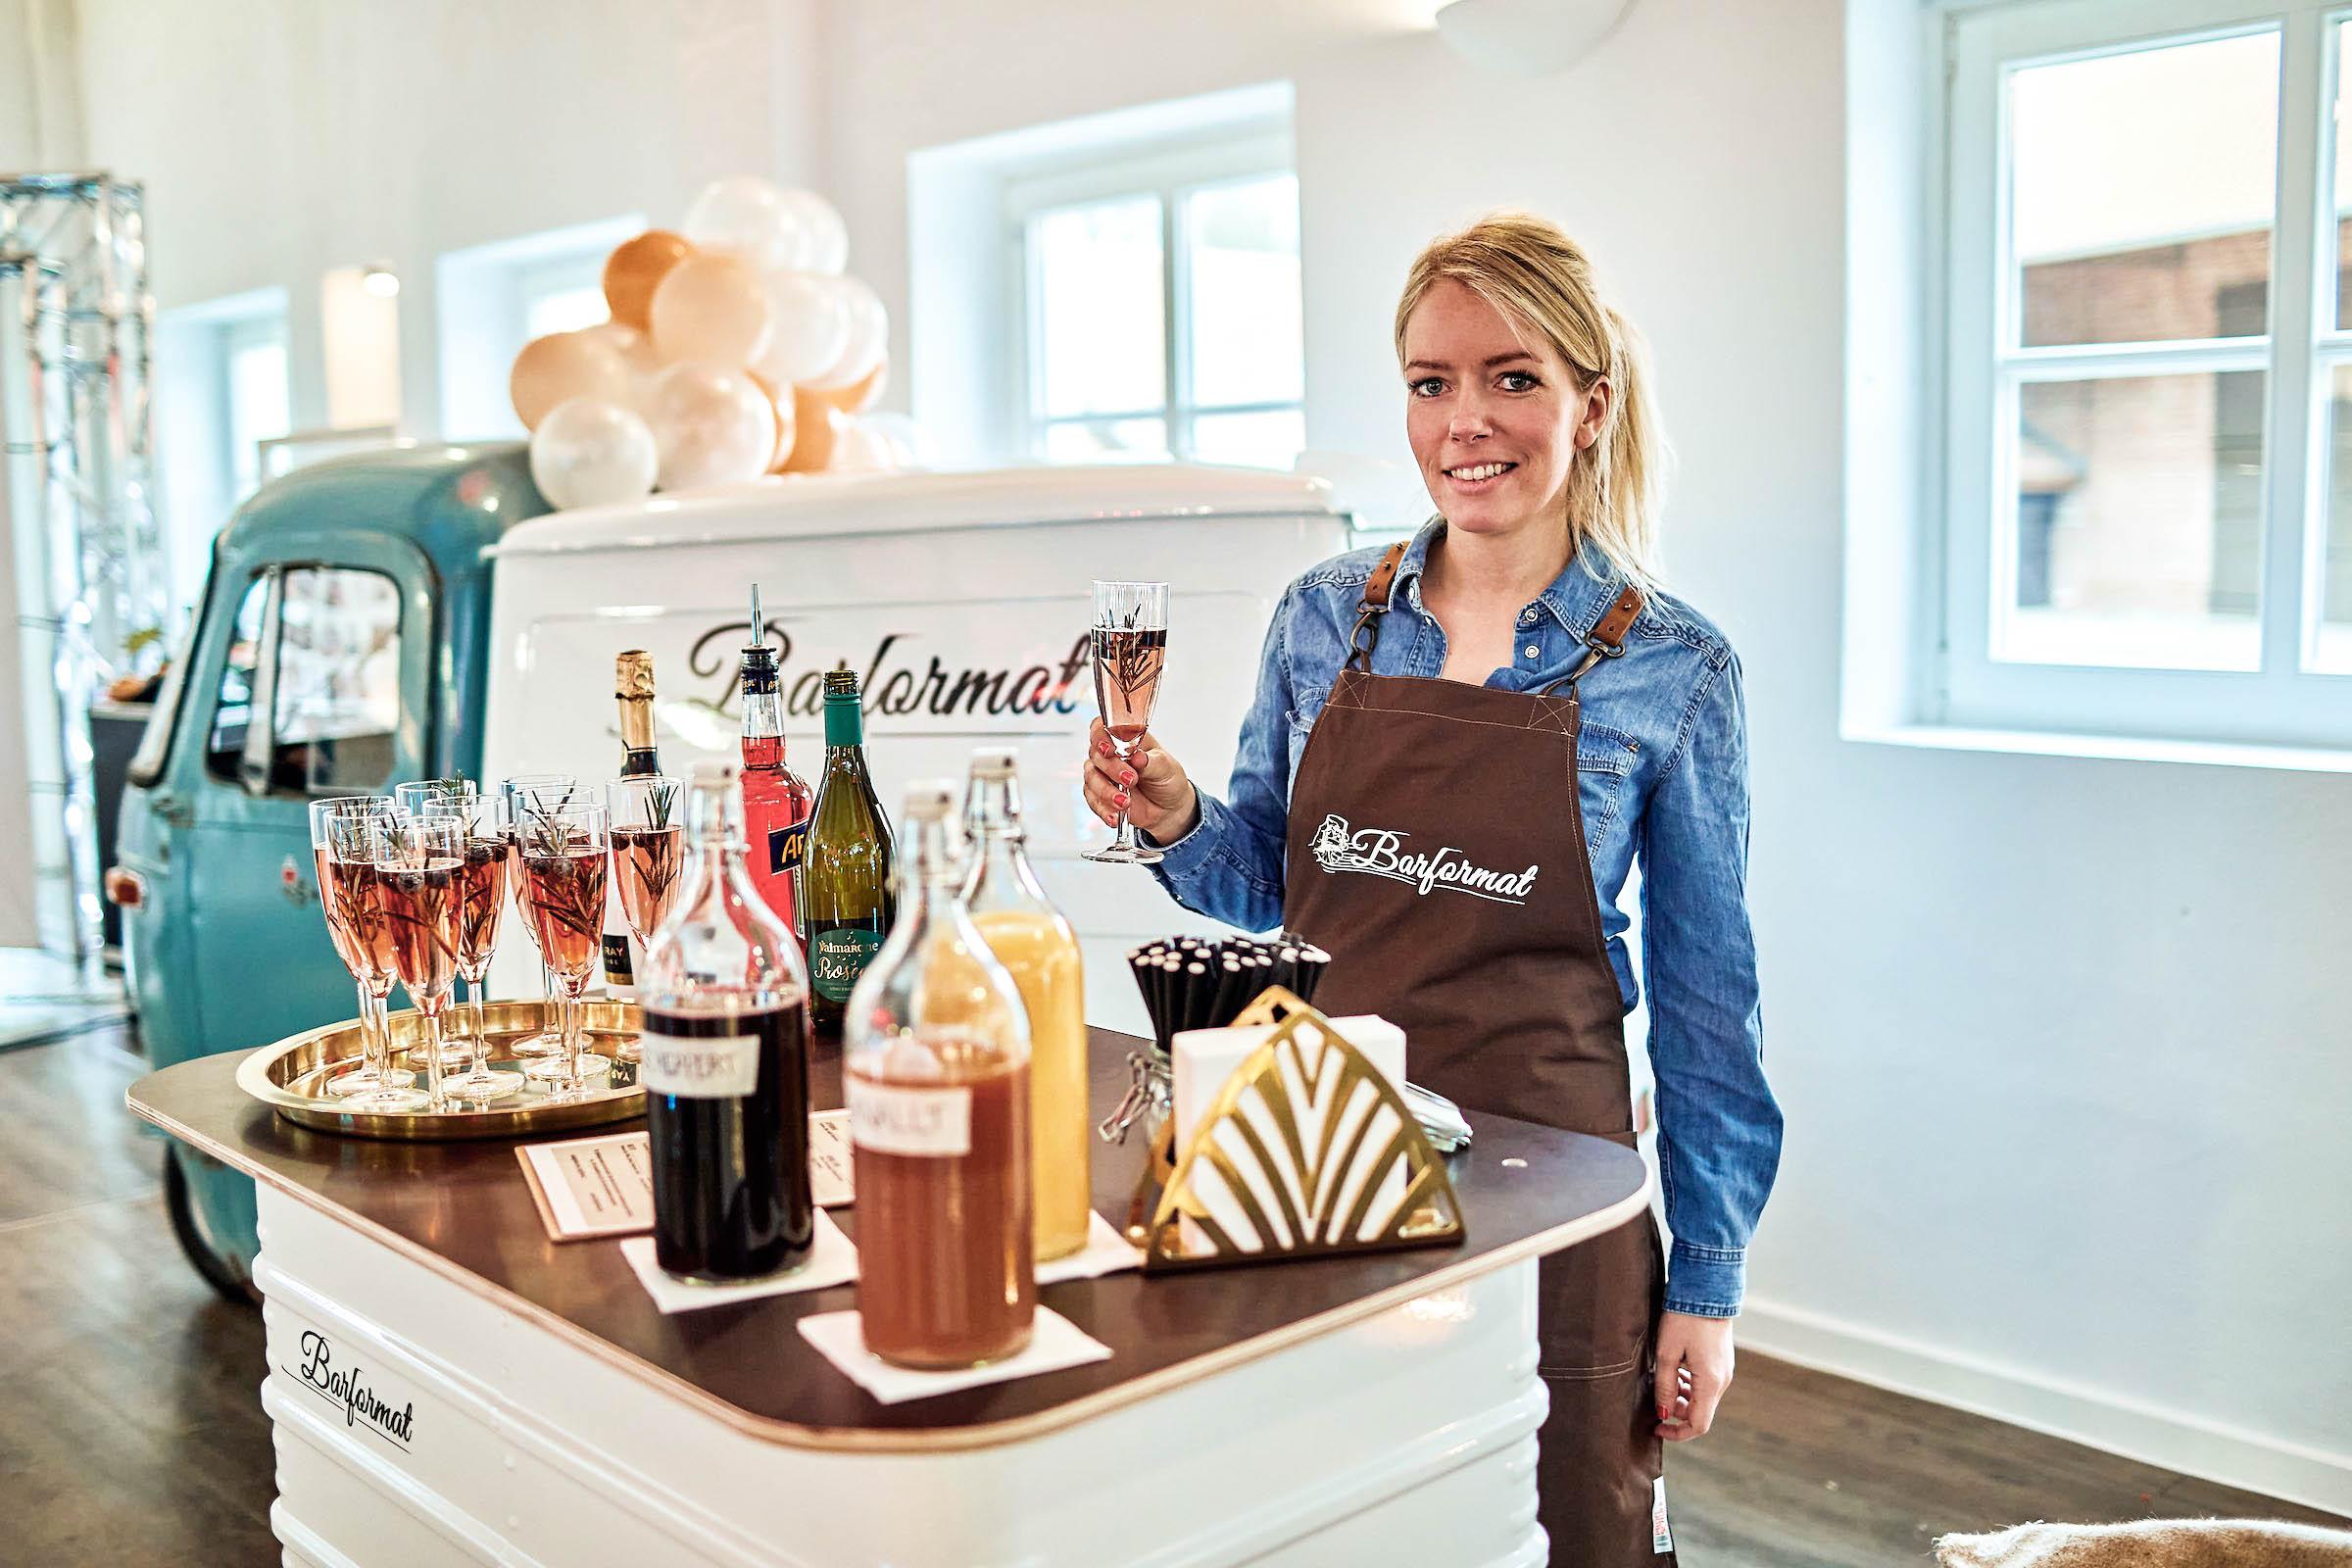 Mobile | Bar | Hannover | Ape | Bulli | Cocktailservice | Getränke | Catering | Foodtruck | Kuchen | Sektempfang | Standesamt | Hochzeit | Barkeeper | Kellner | Hochzeit | Event | Mieten | Buchen | Barformat